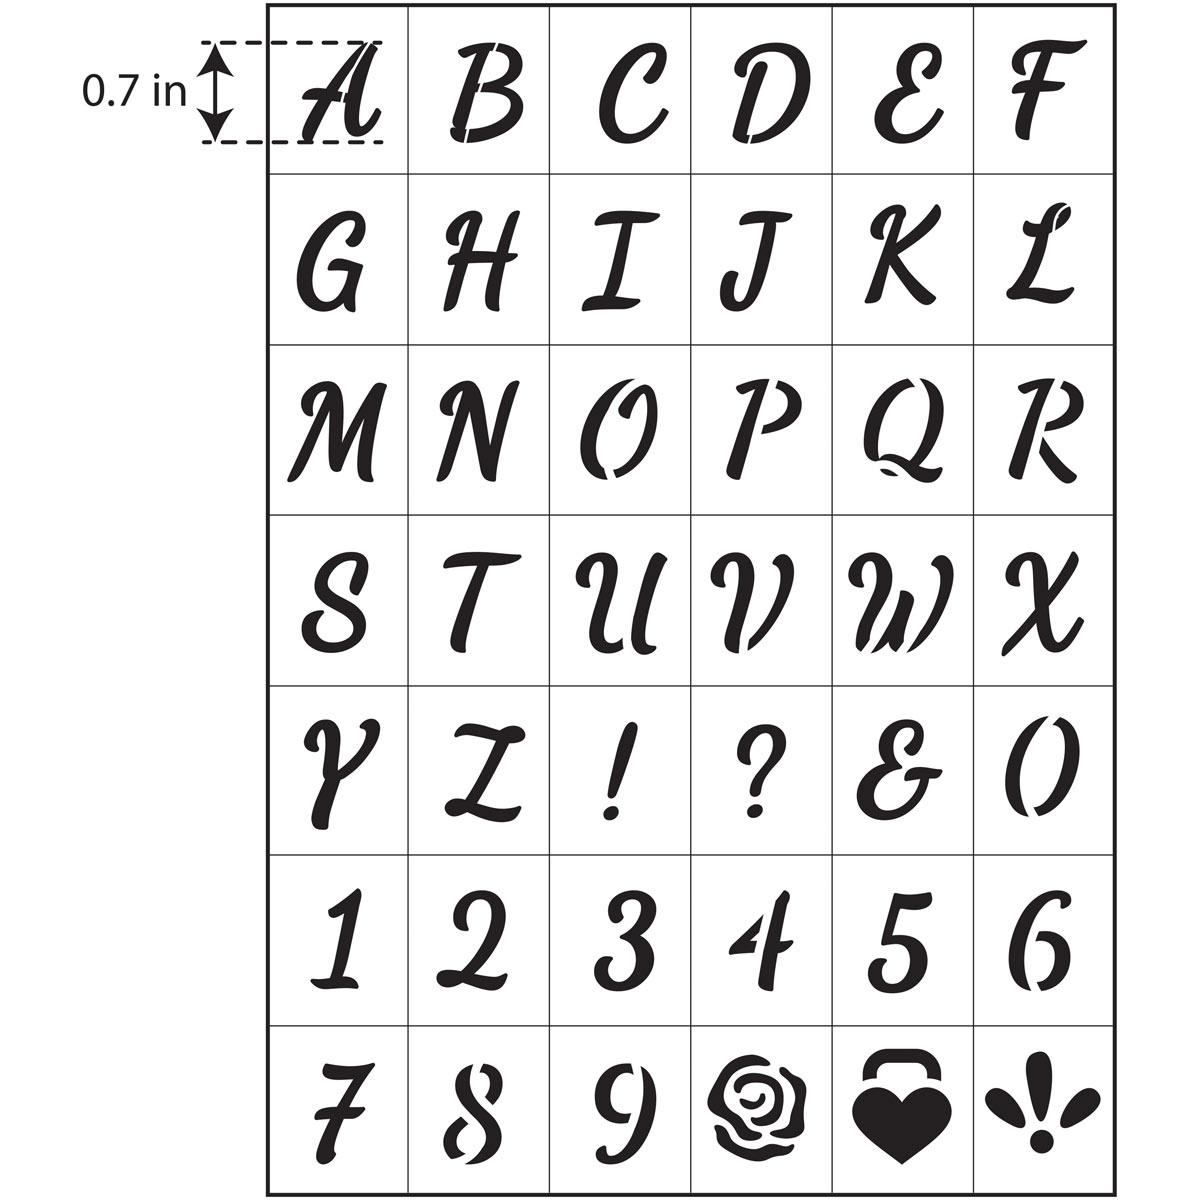 FolkArt ® Peel & Stick Painting Stencils™ - Script Font Alphabet - 63290E